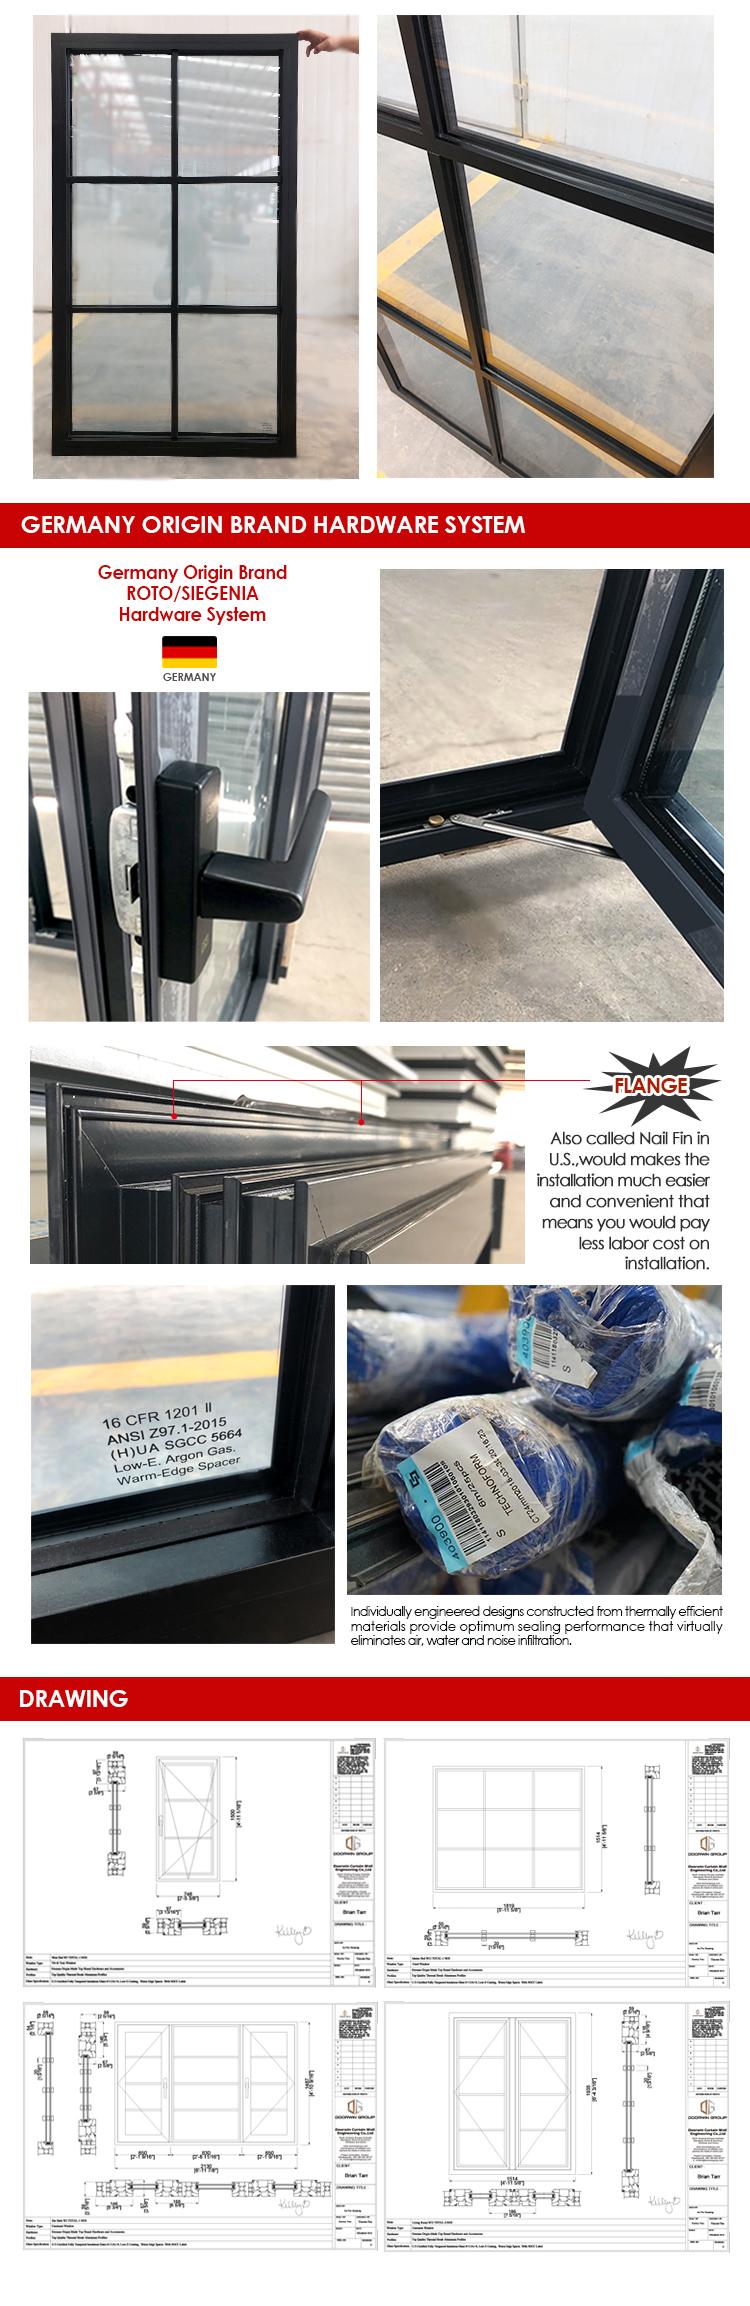 2020 Fashion IGCC certified glass hot selling double galzing windows tilt-turn window tilt&turn